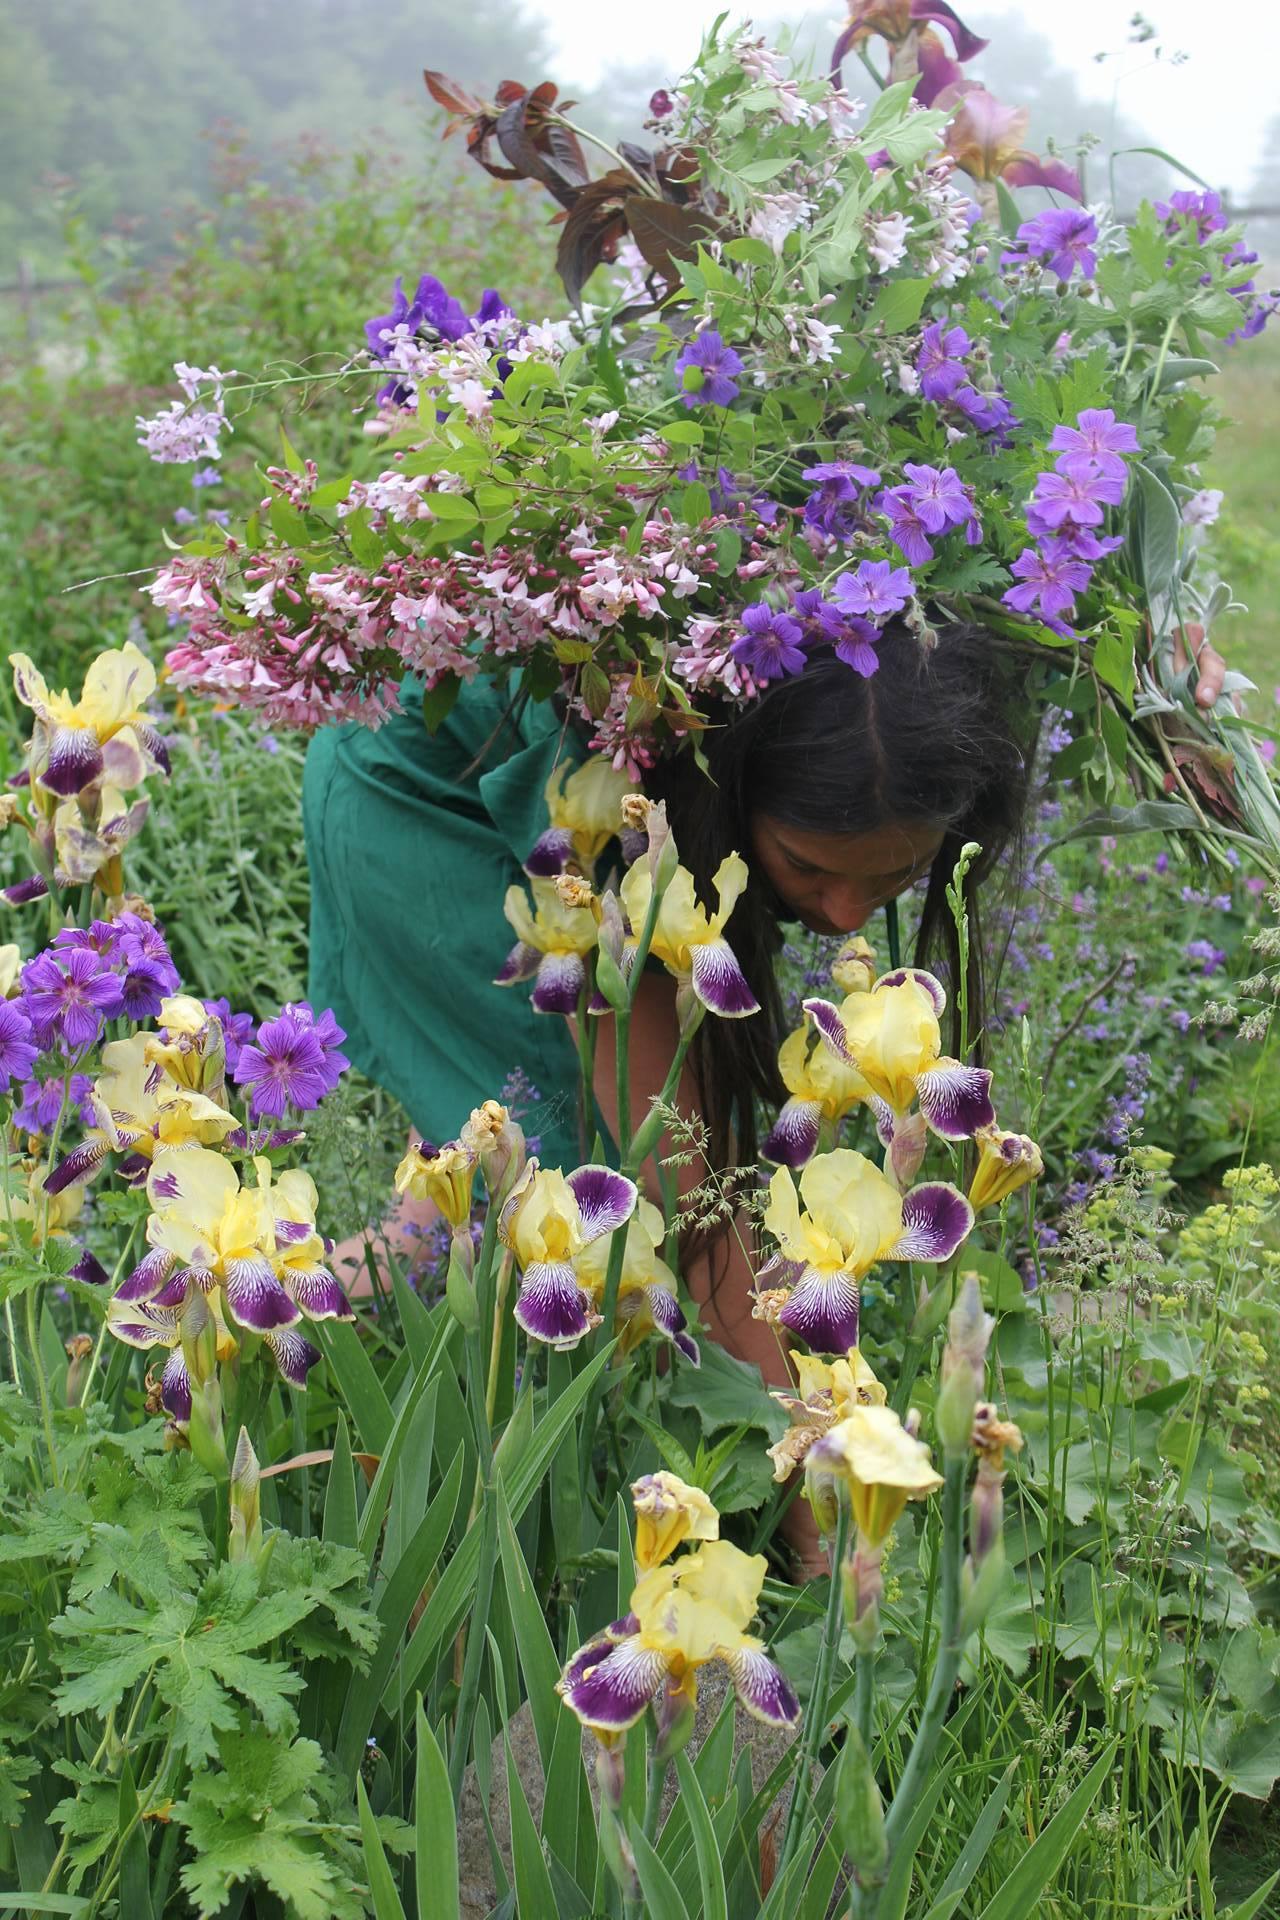 Halifax bouquet subscription / flower CSA 2018. Luxury hand-tied farm fresh flowers. Hedgerow Flower Company, a flower farm and florist, Nova Scotia, Canada.